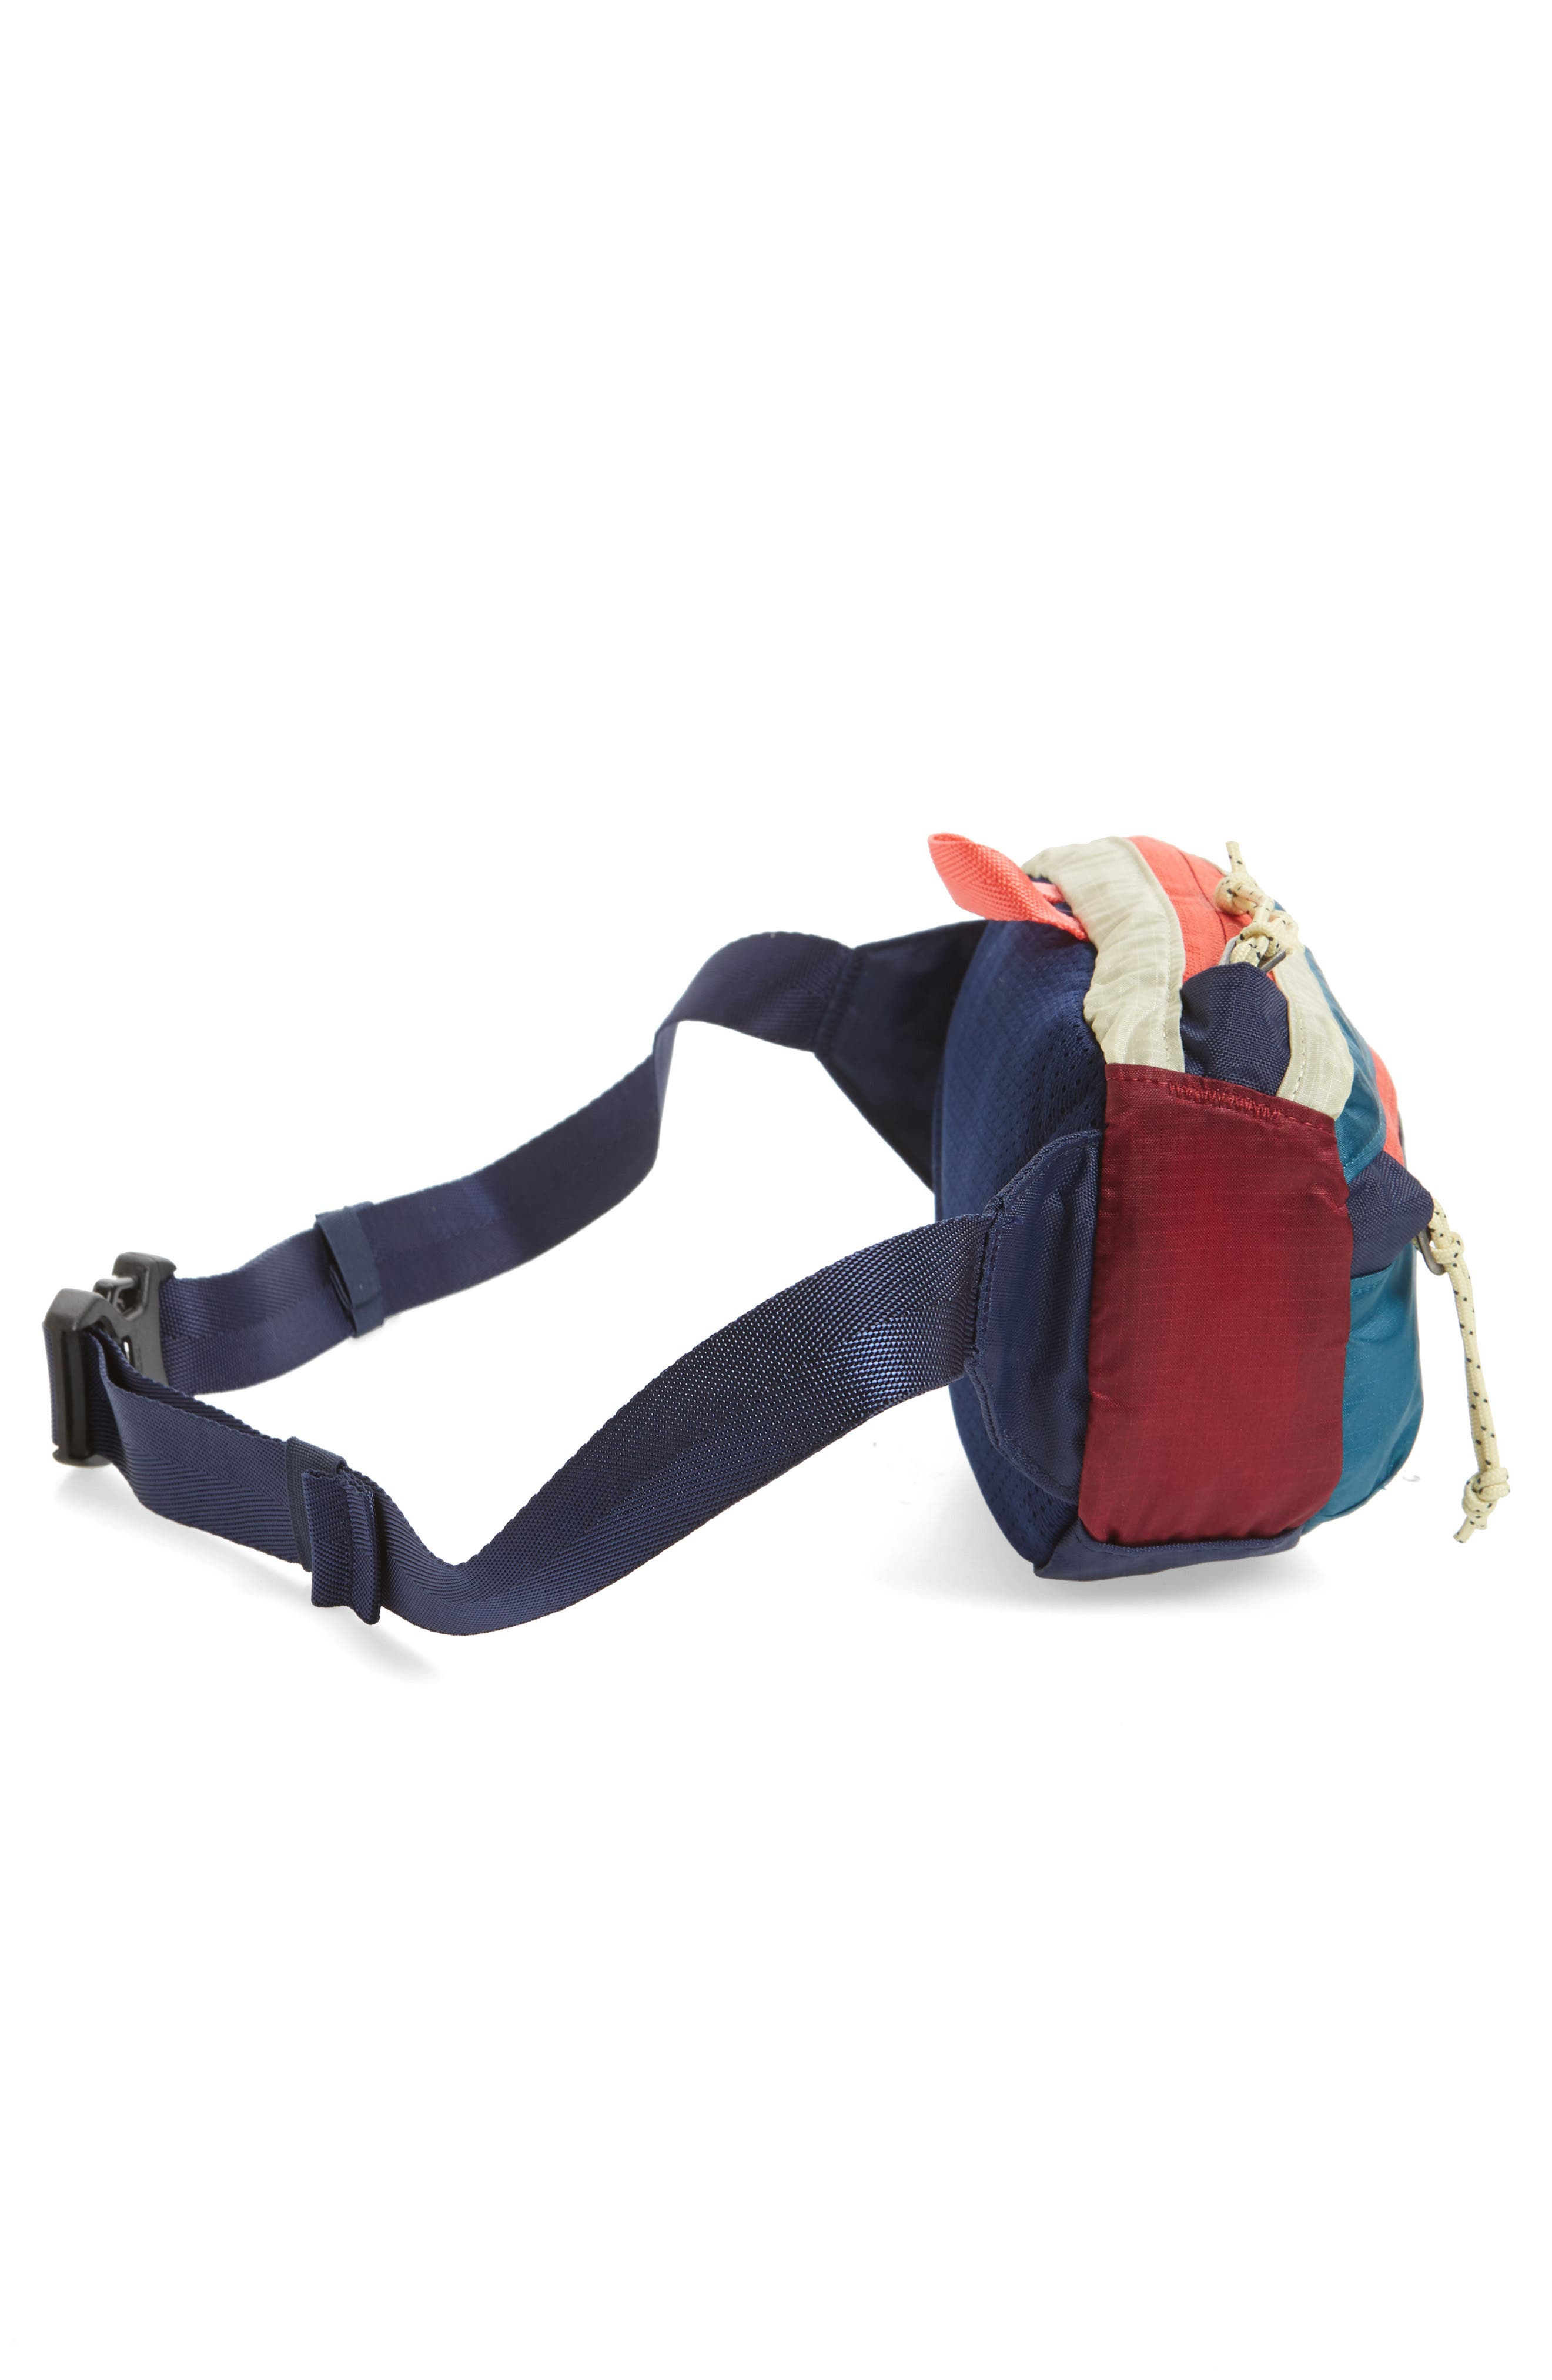 PATAGONIA, Travel Belt Bag, Alternate thumbnail 6, color, PATCHWORK ARROW RED / NAVY